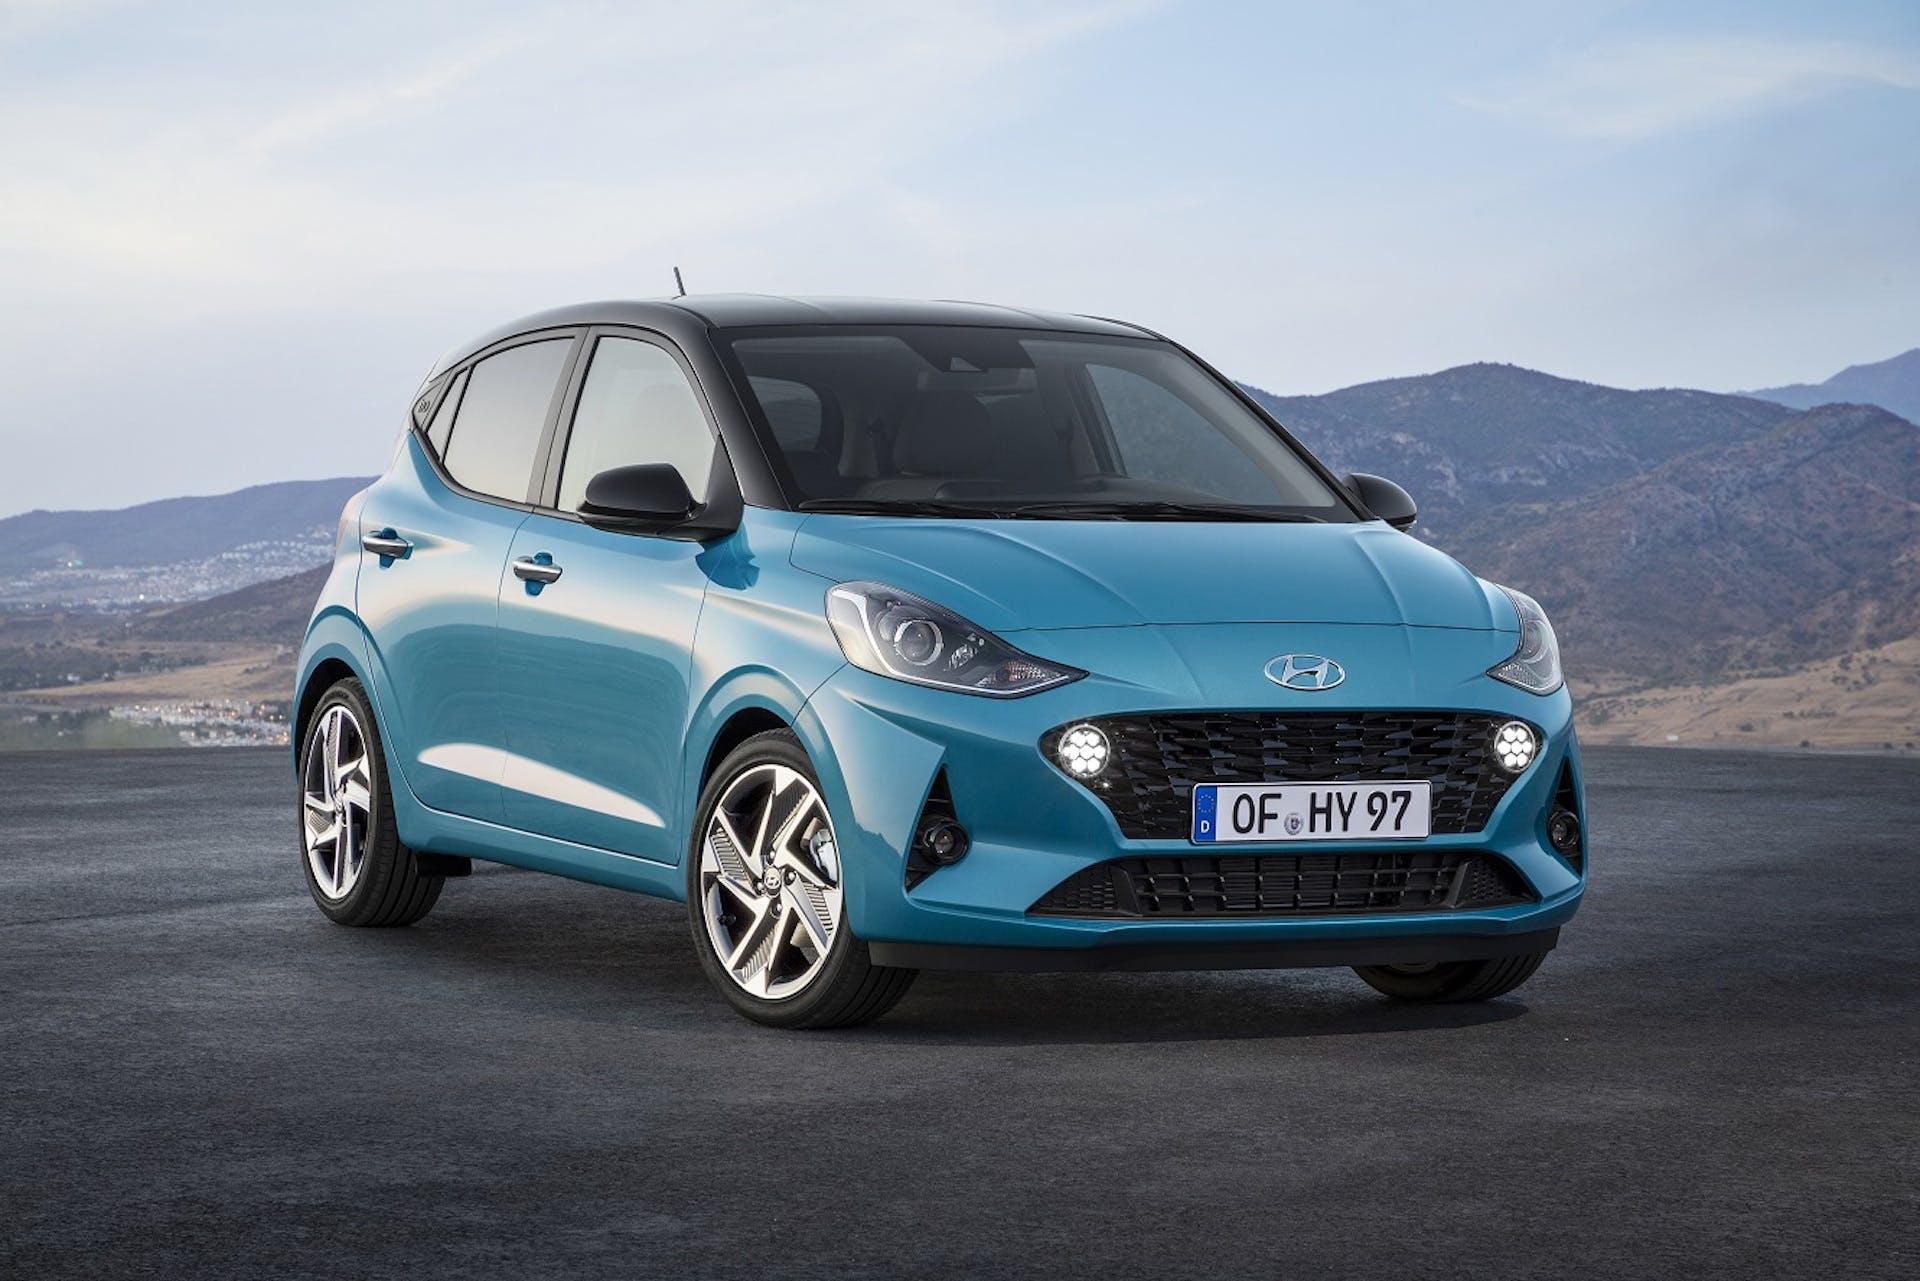 Nuova Hyundai i10 azzurra ferma